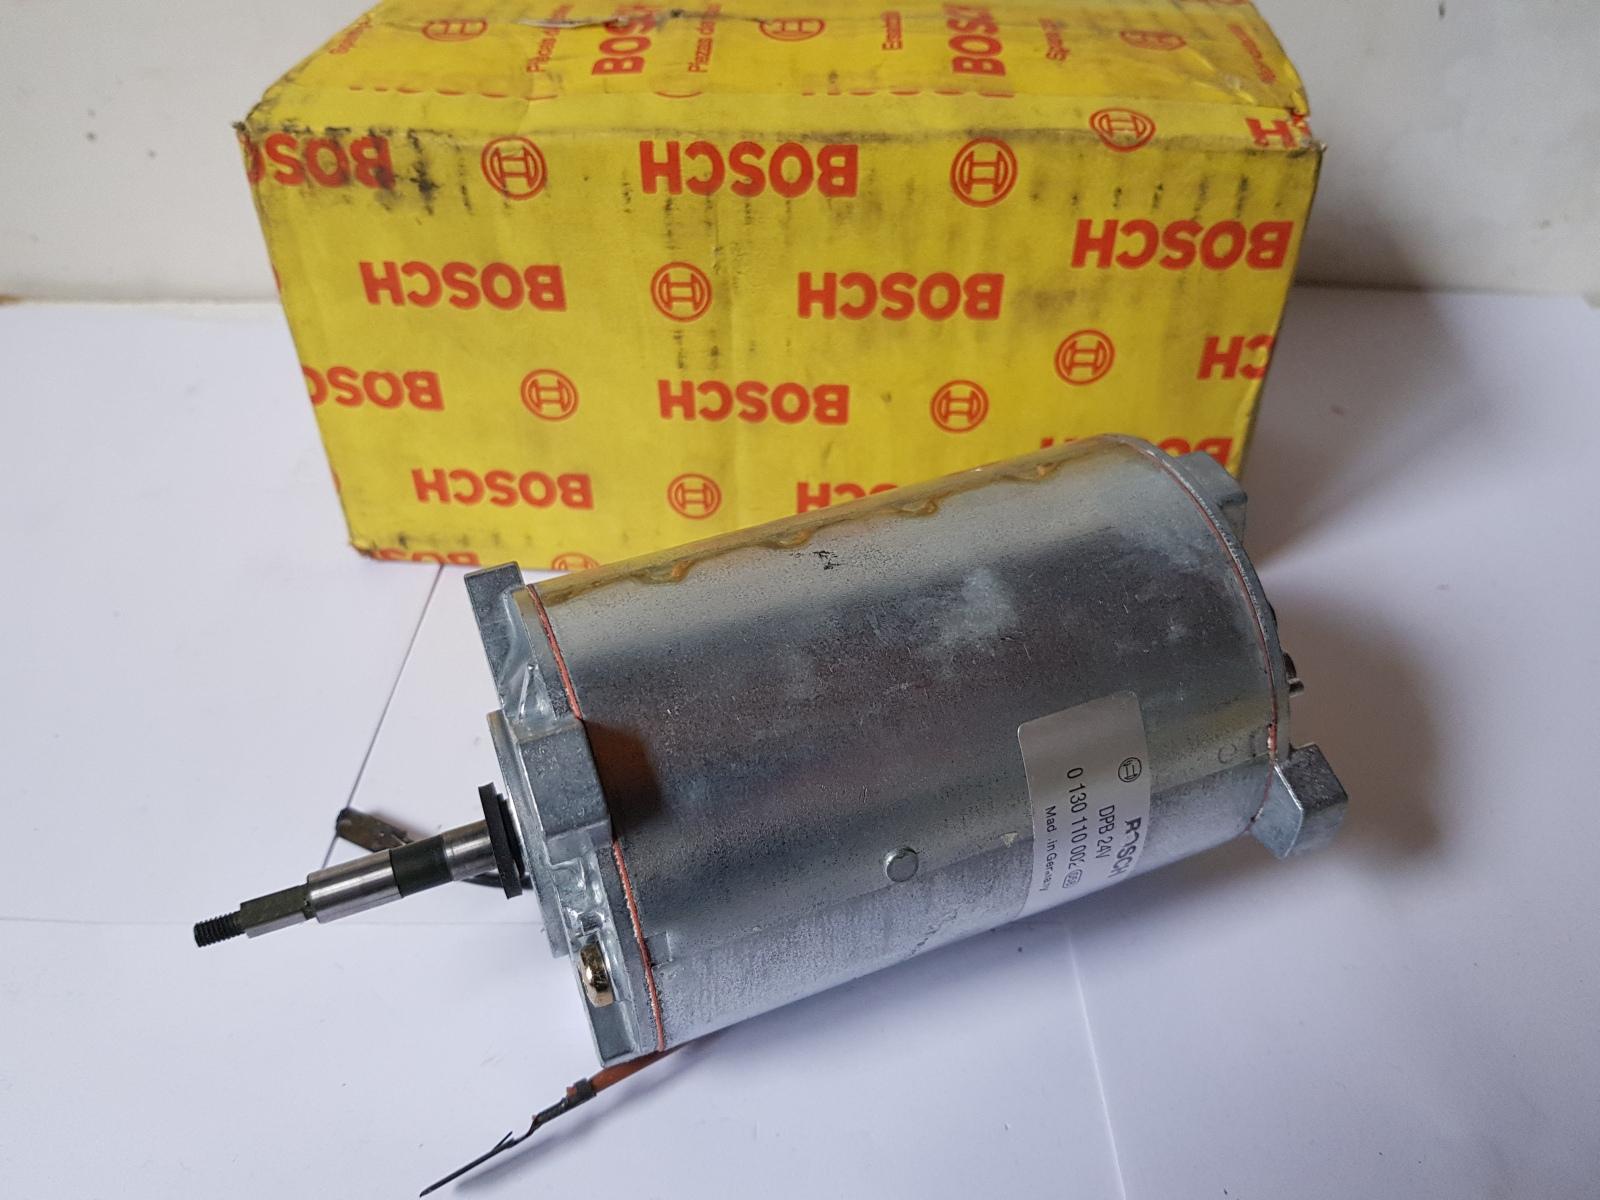 Bosch 0130110002 Gleichstrommotor Motor Umwälzpumpe Blower Elektromotor